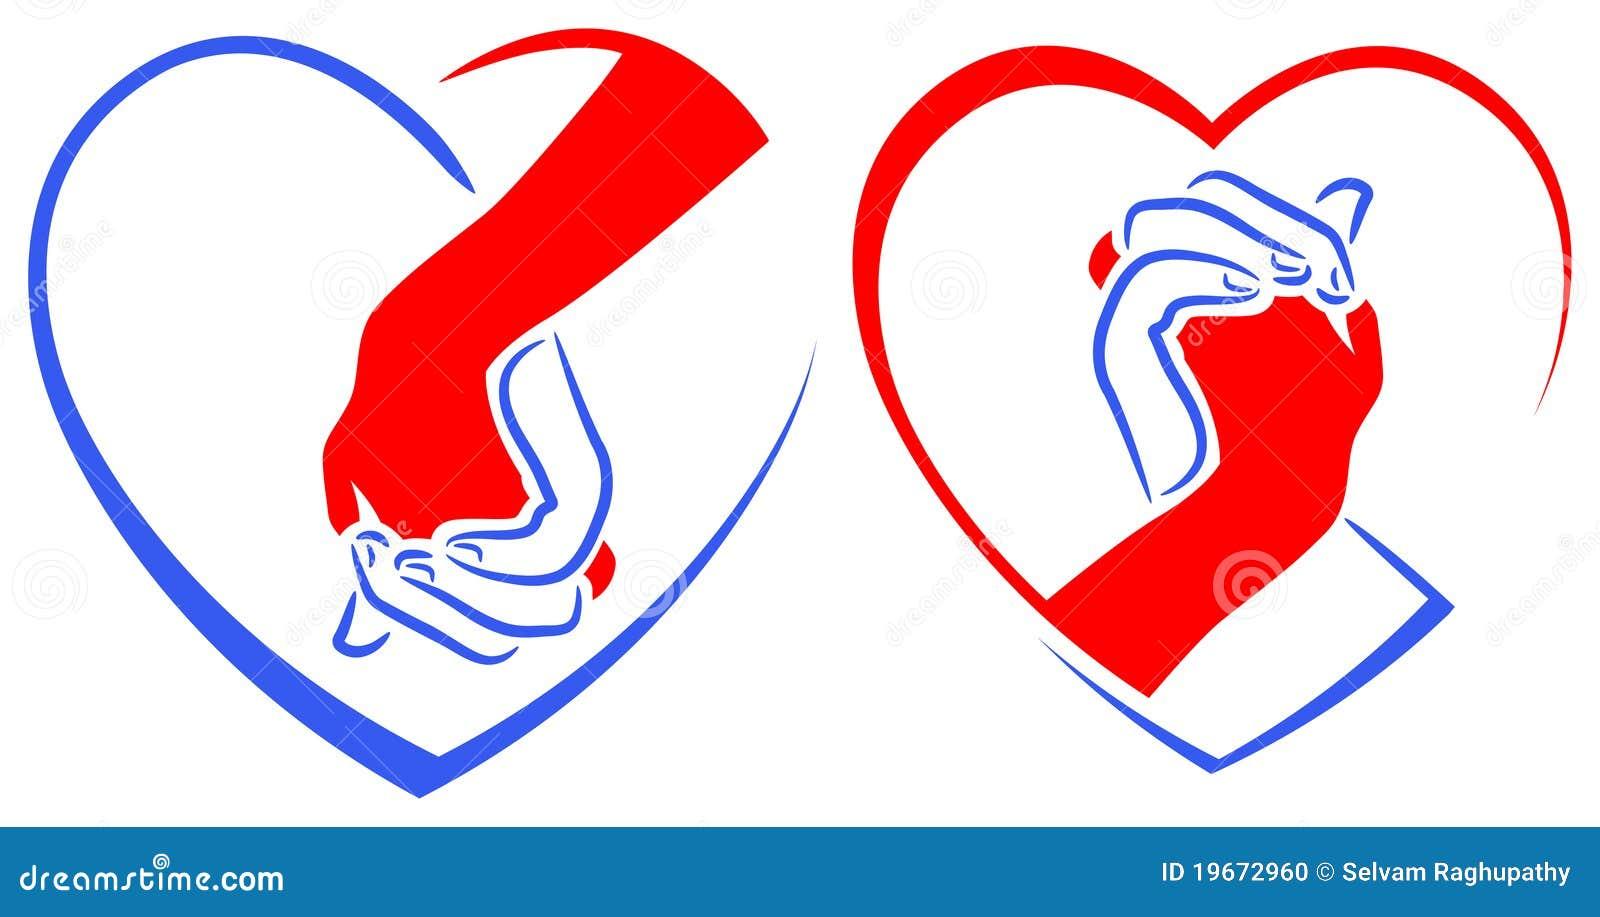 Friendship Logo Designs Stock Photo Image 19672960